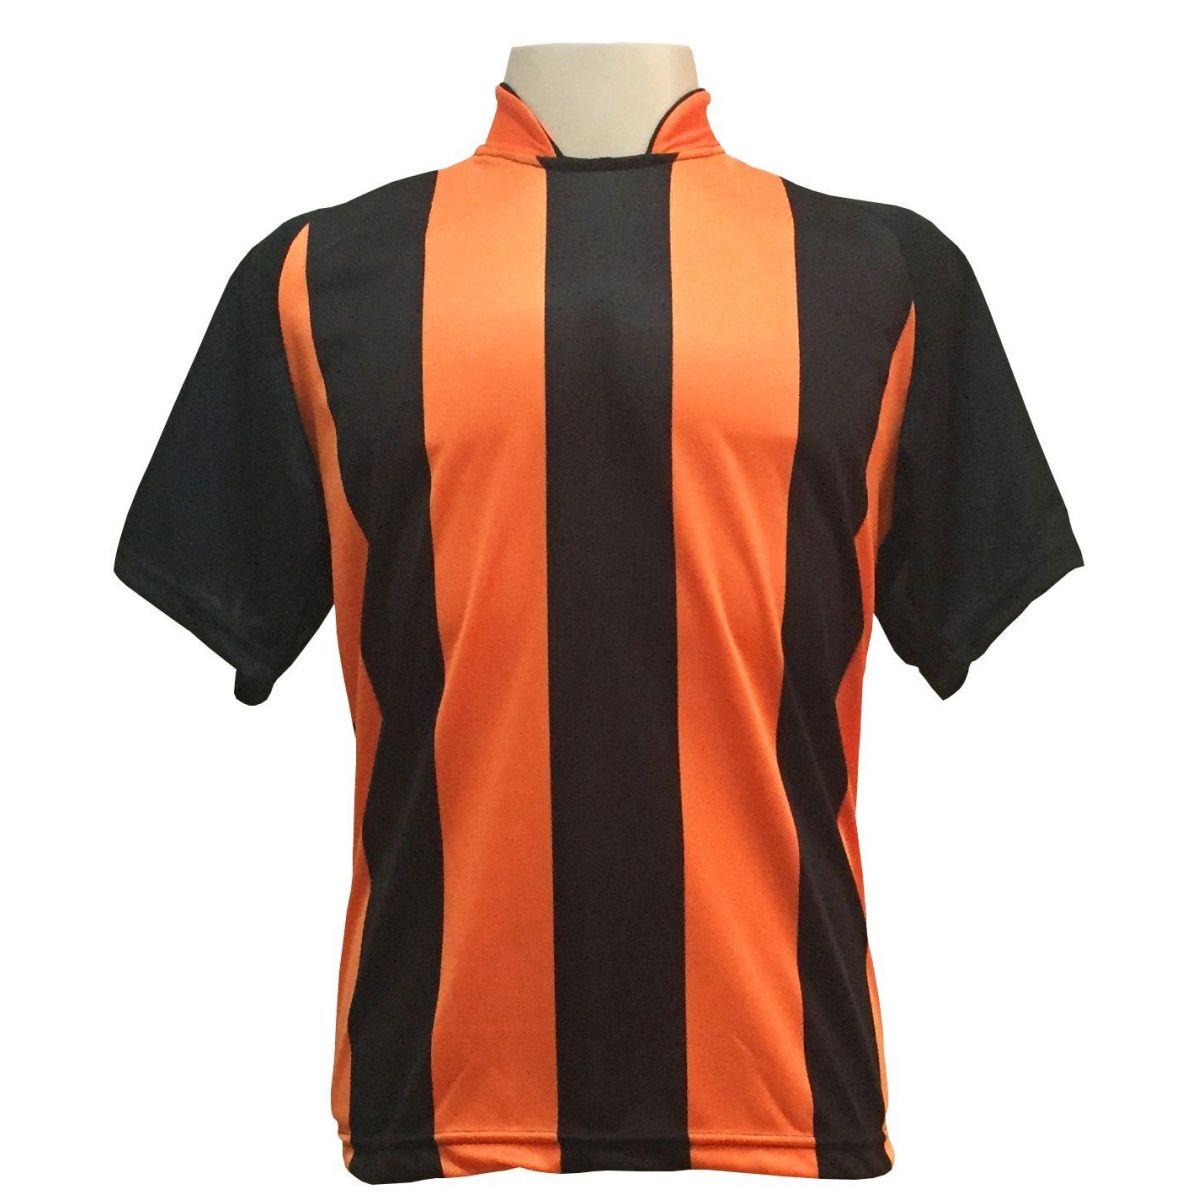 Jogo de Camisa com 12 unidades modelo Milan Preto/Laranja + Brindes